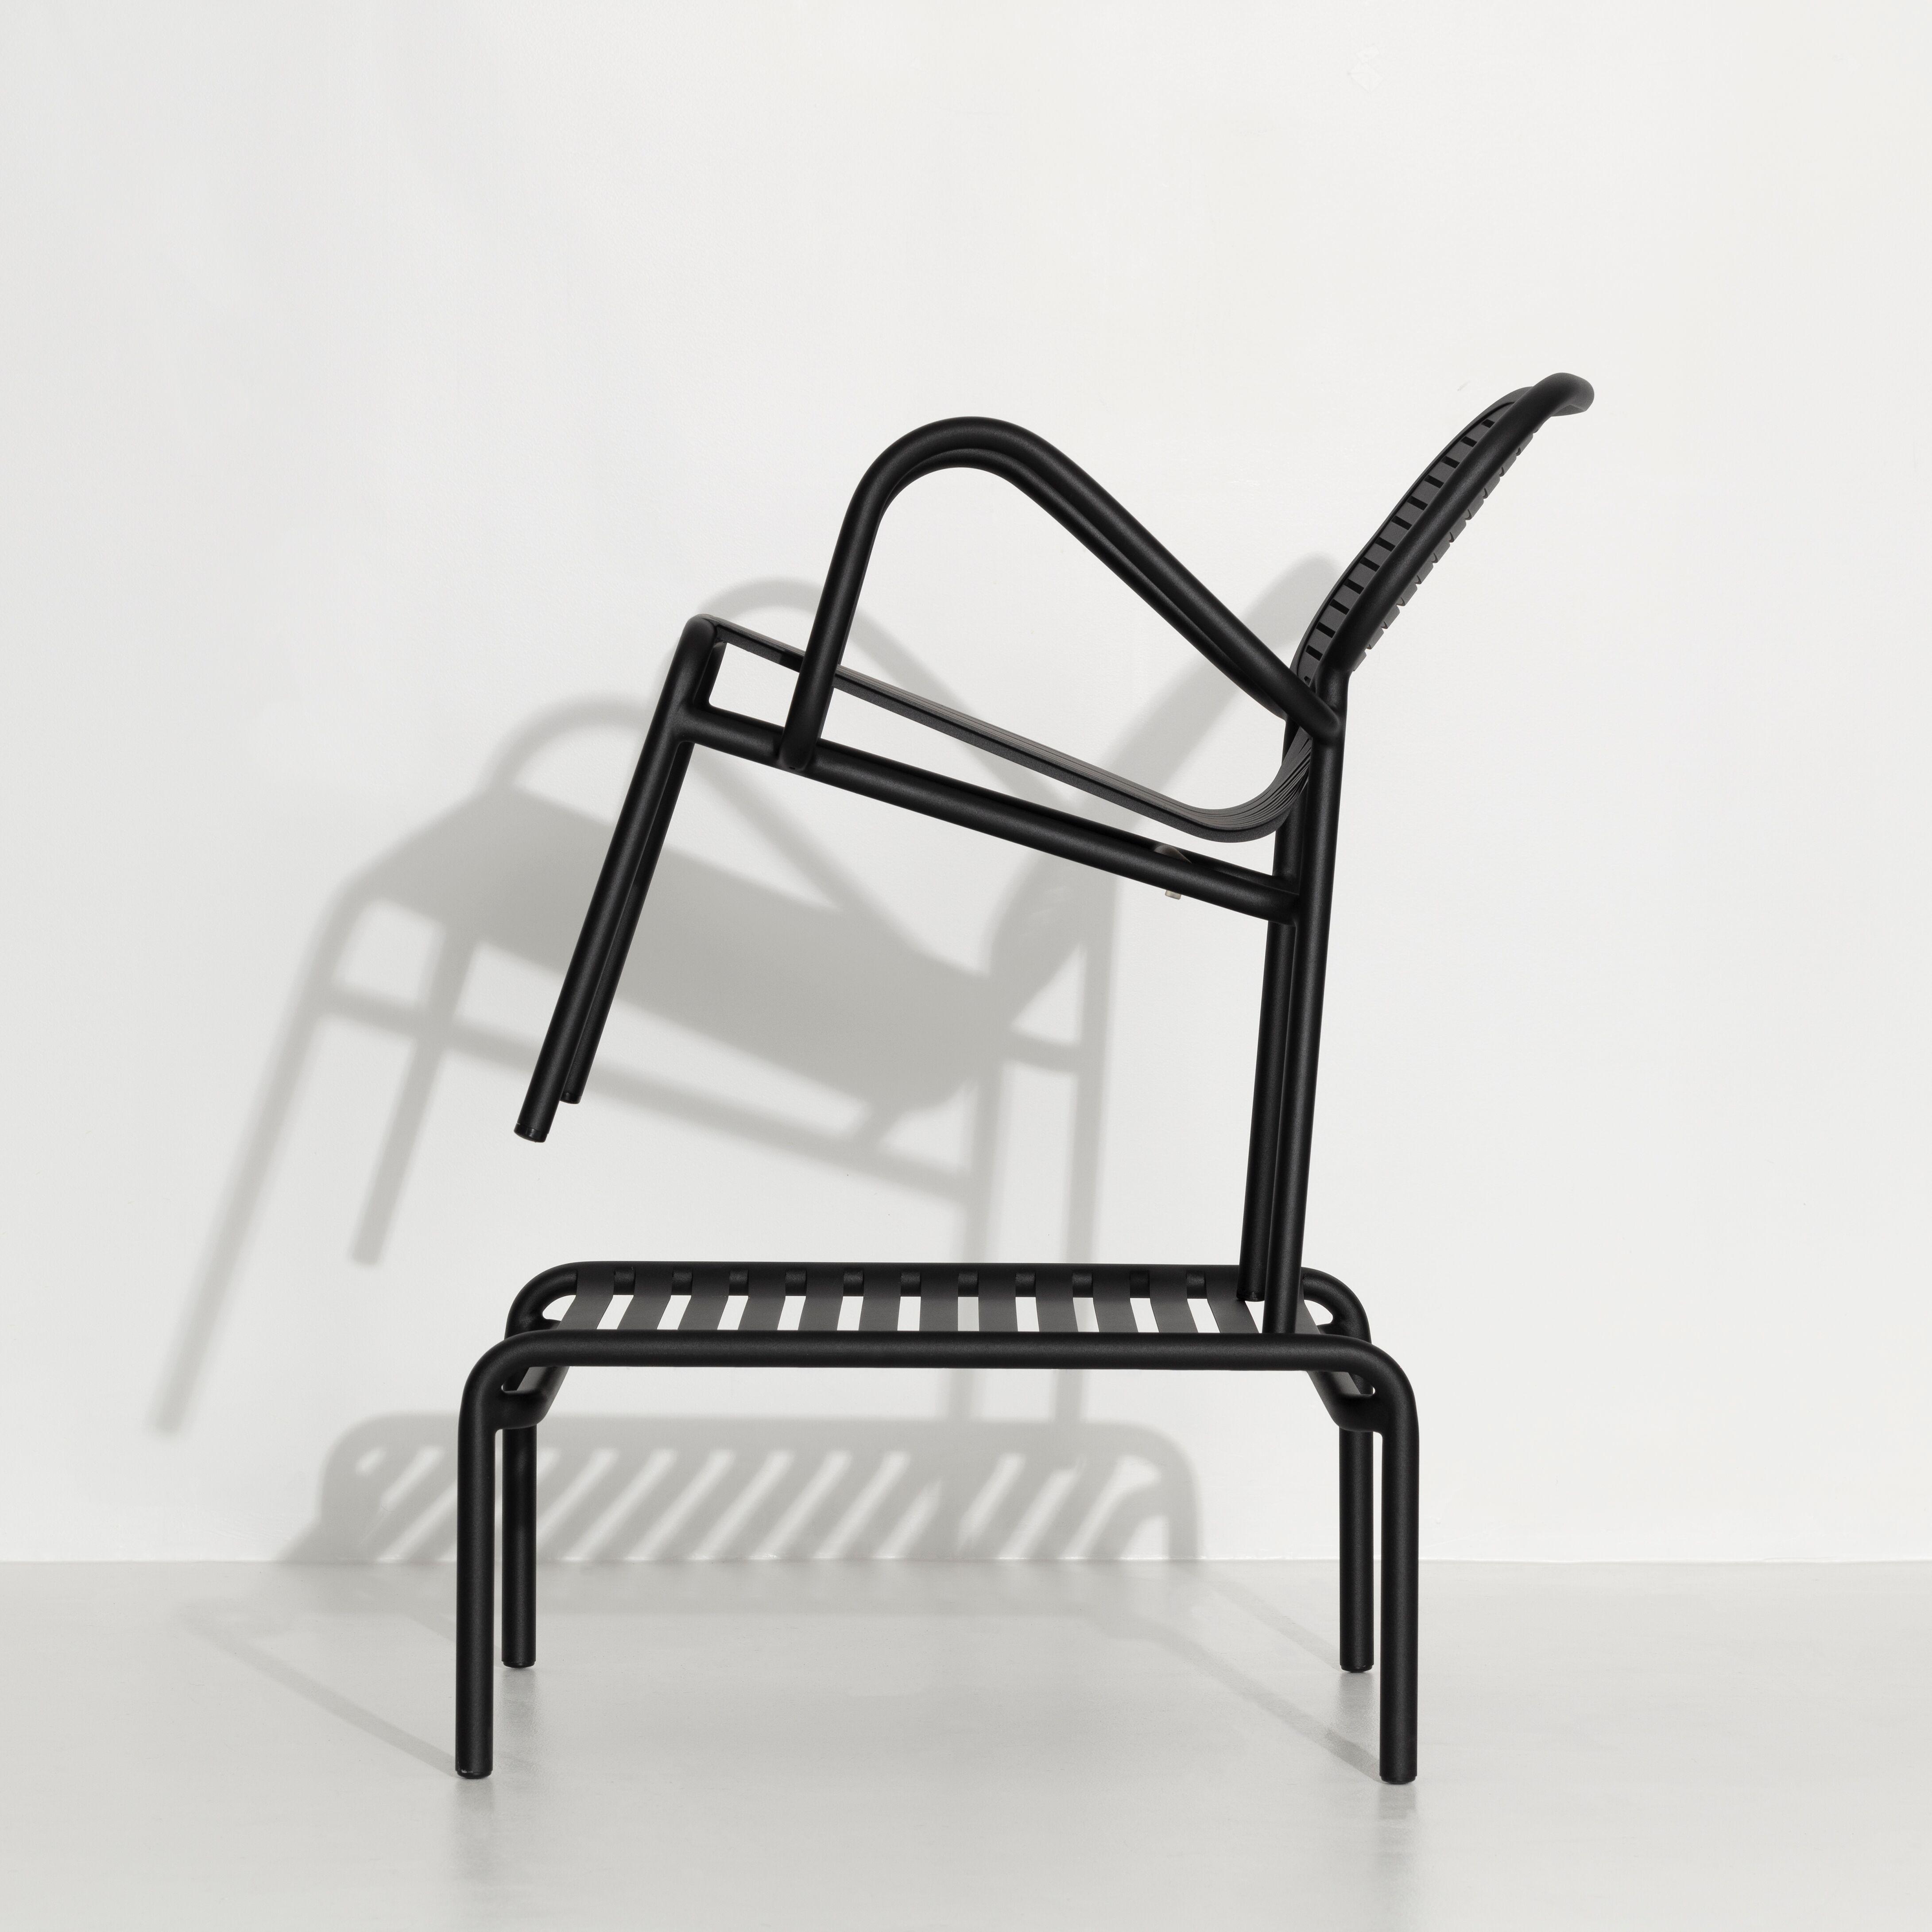 Table basse | Mobilier de jardin design - Design outdoor ...